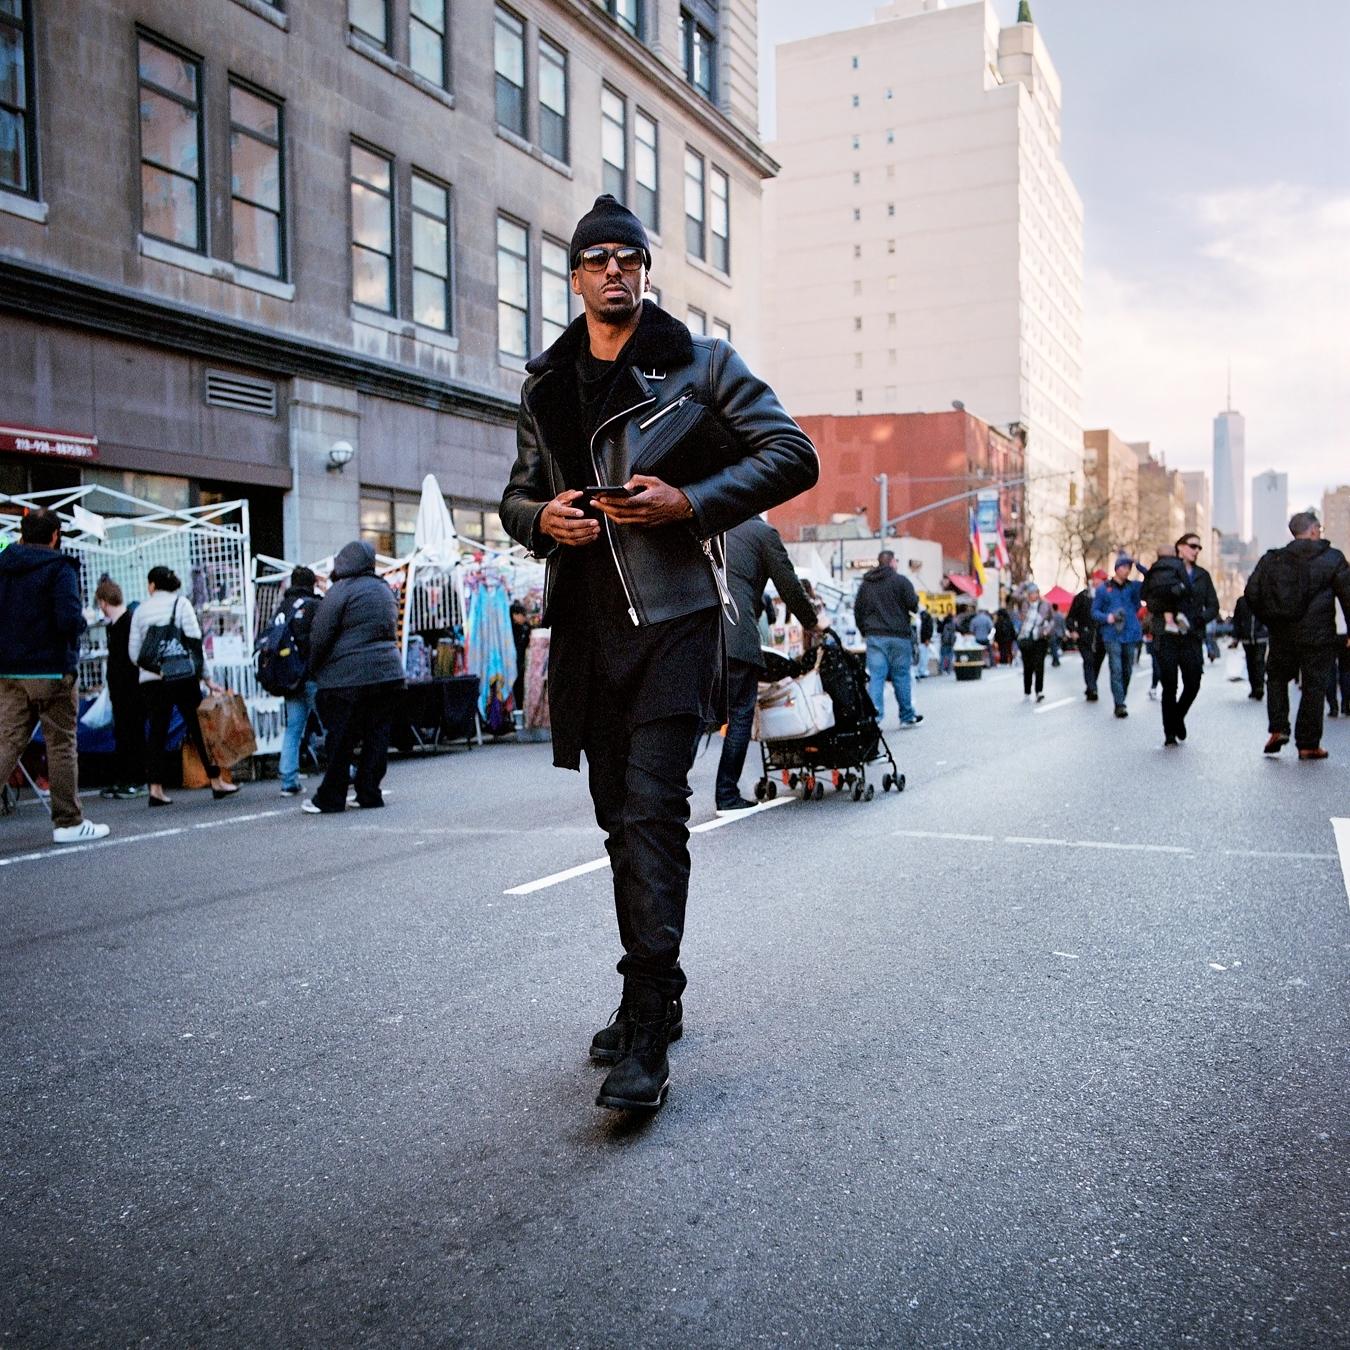 Maud WALAS Street photography NEW YORK 07.jpg